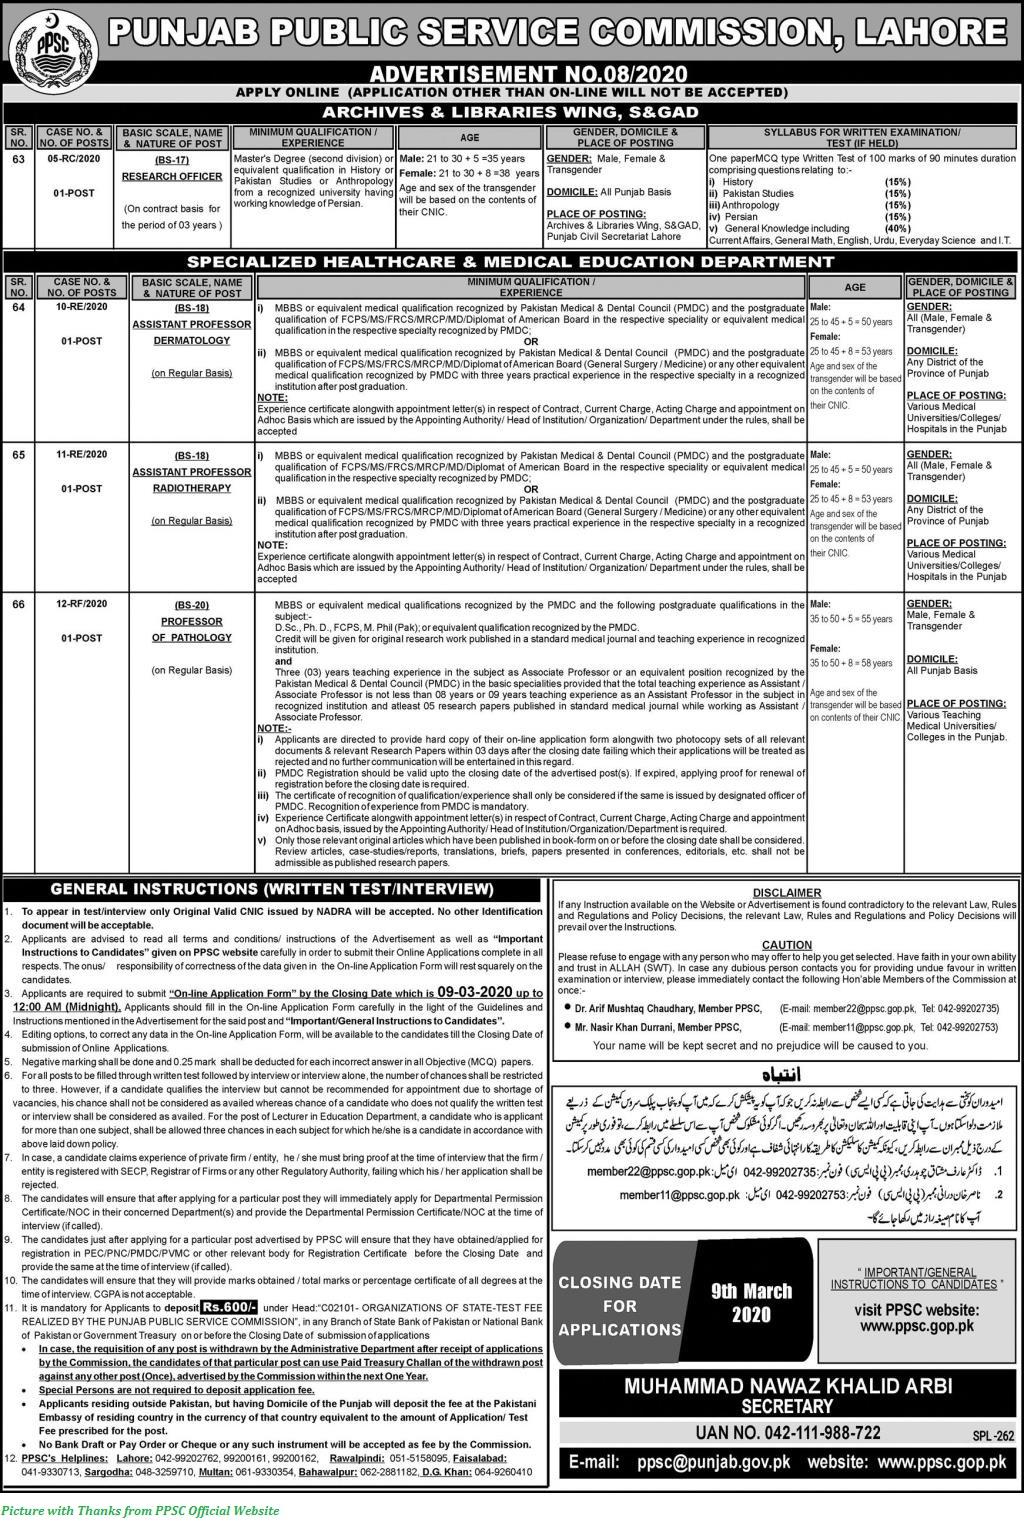 PPSC Jobs 2020 - Latest Jobs in Punjab Public Service Commission Advertisement No. 08/2020